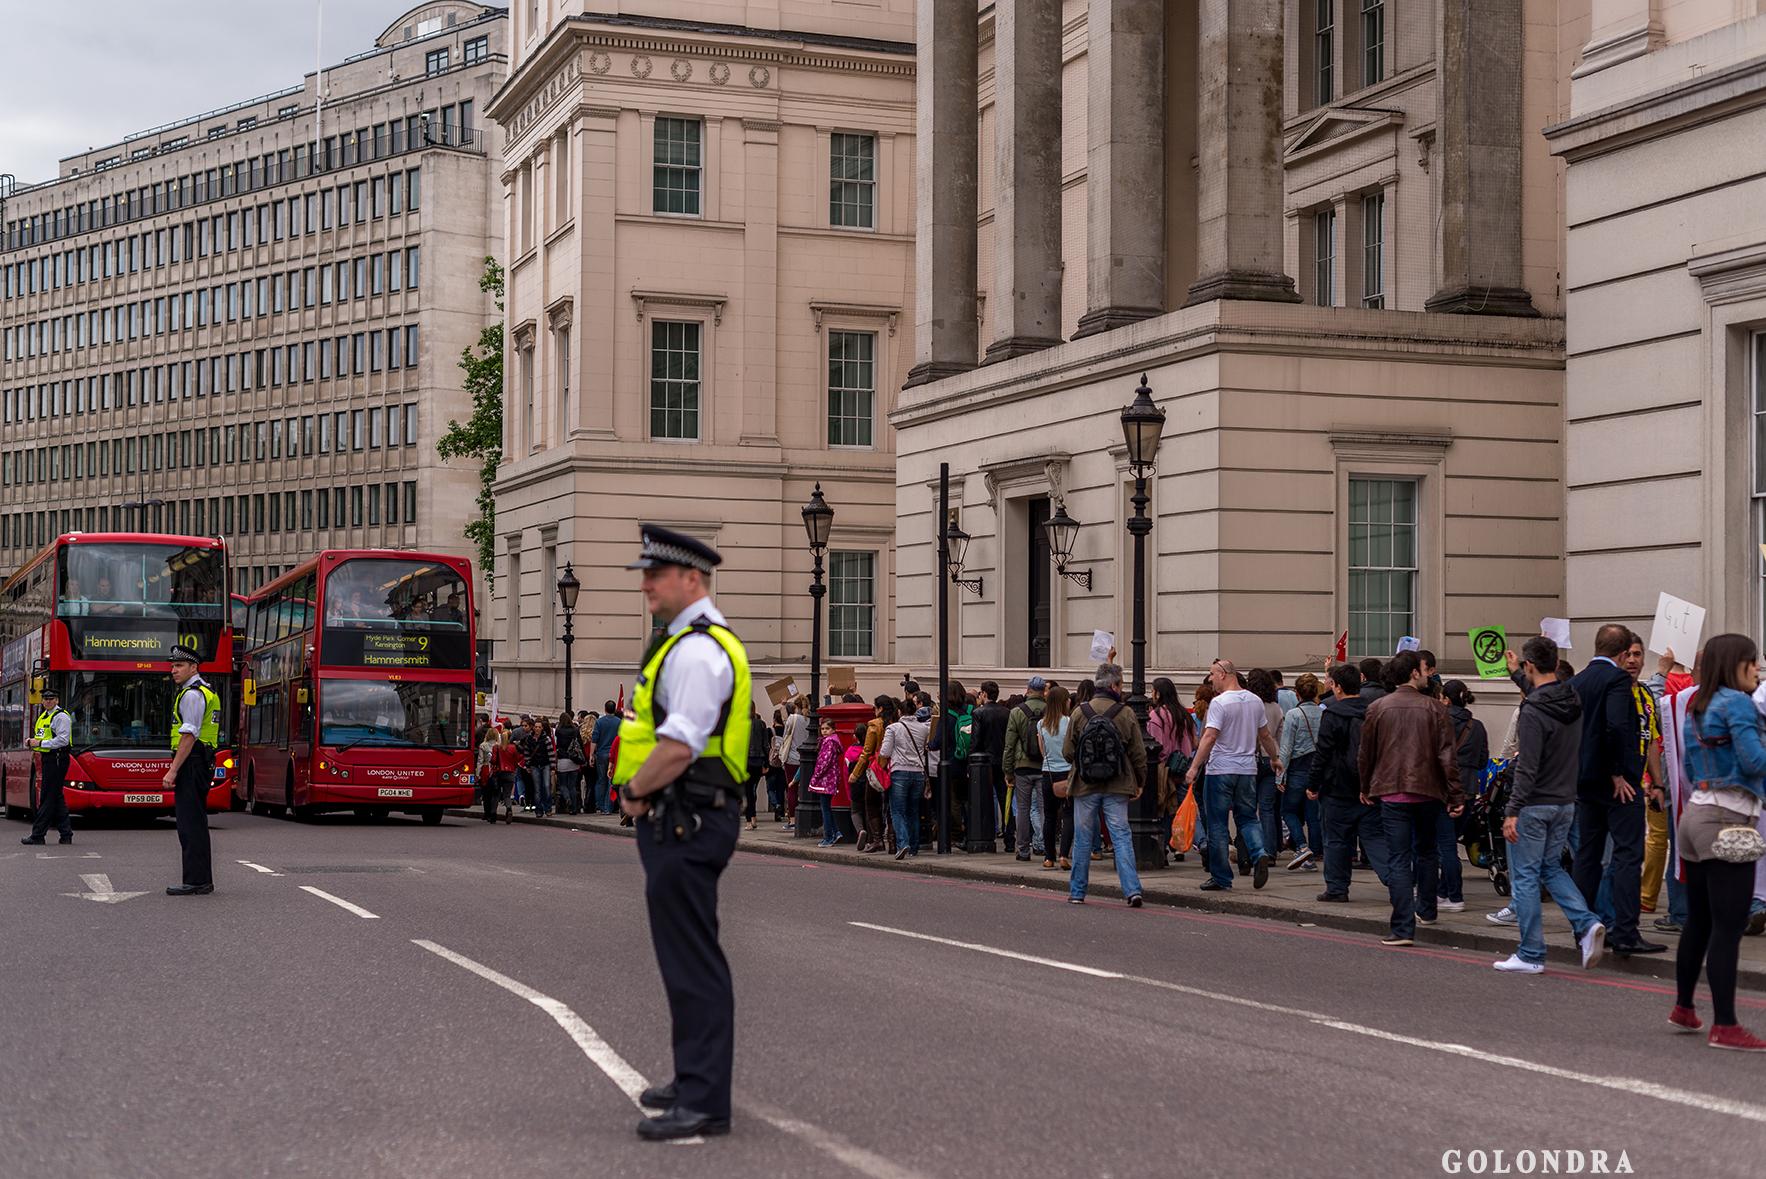 Protesting Turkish Government - Turk Hukumetini Protesto - Londra - London (35)